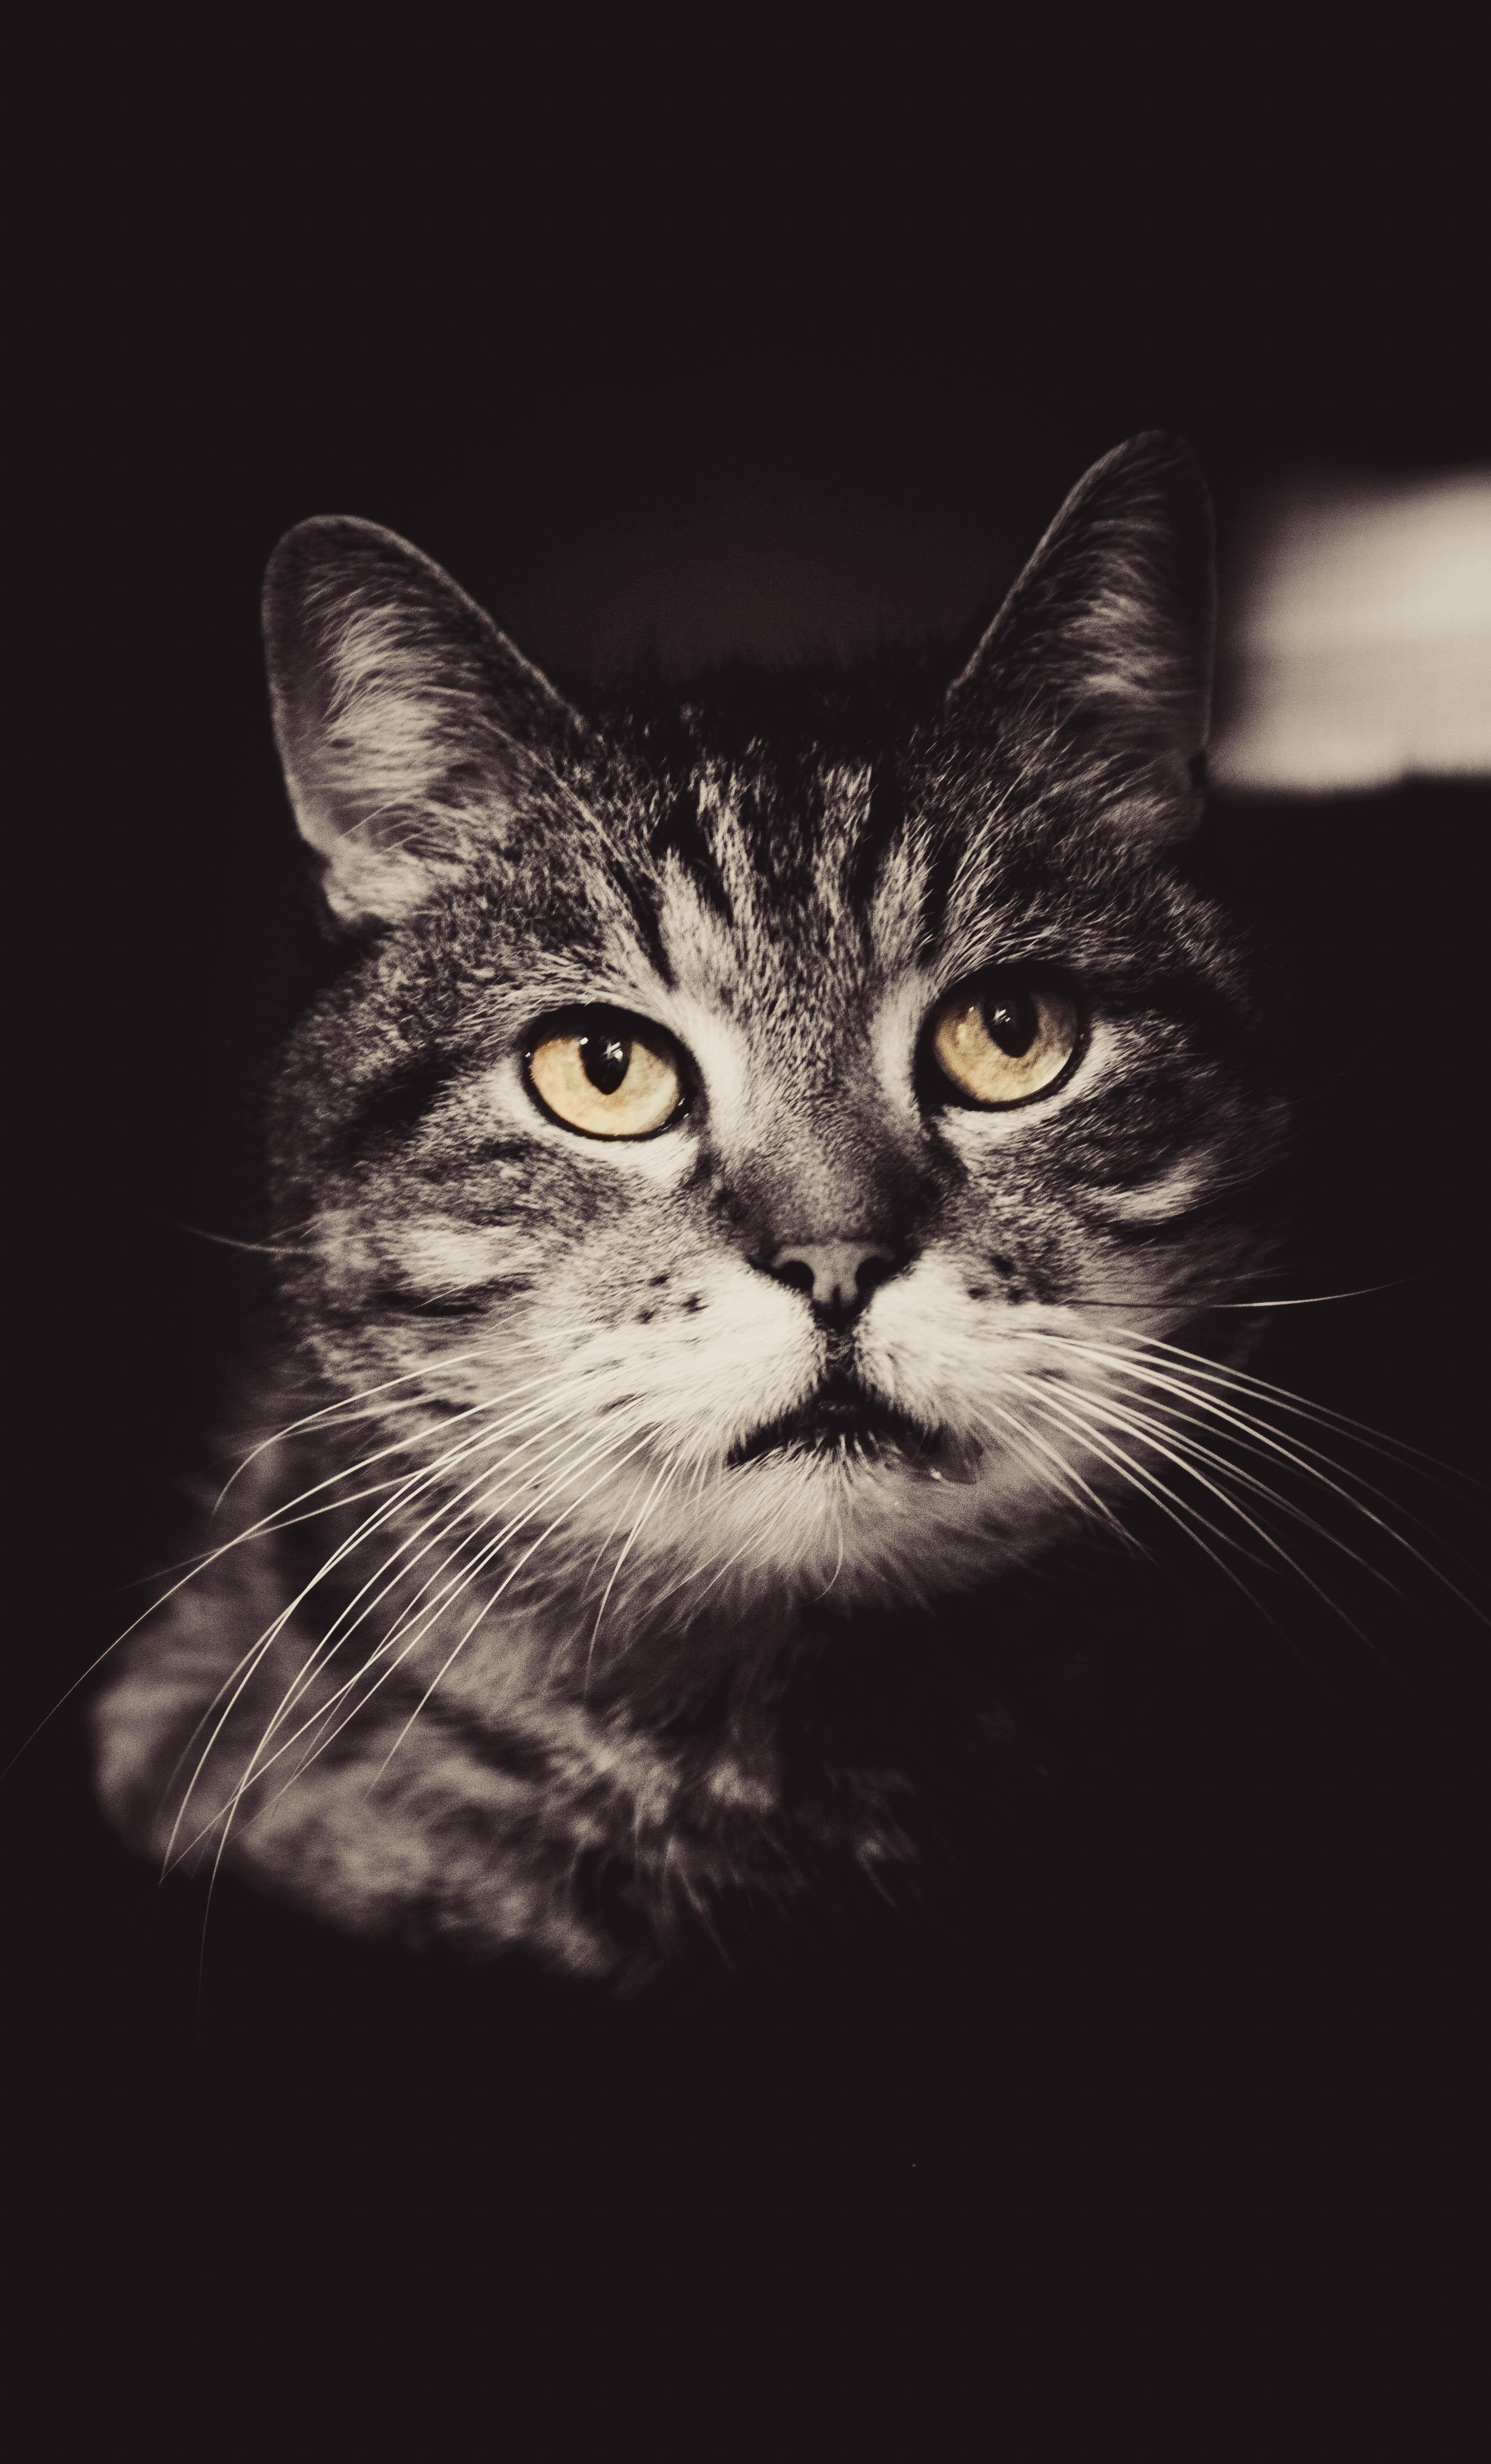 Graysclae photo of cat